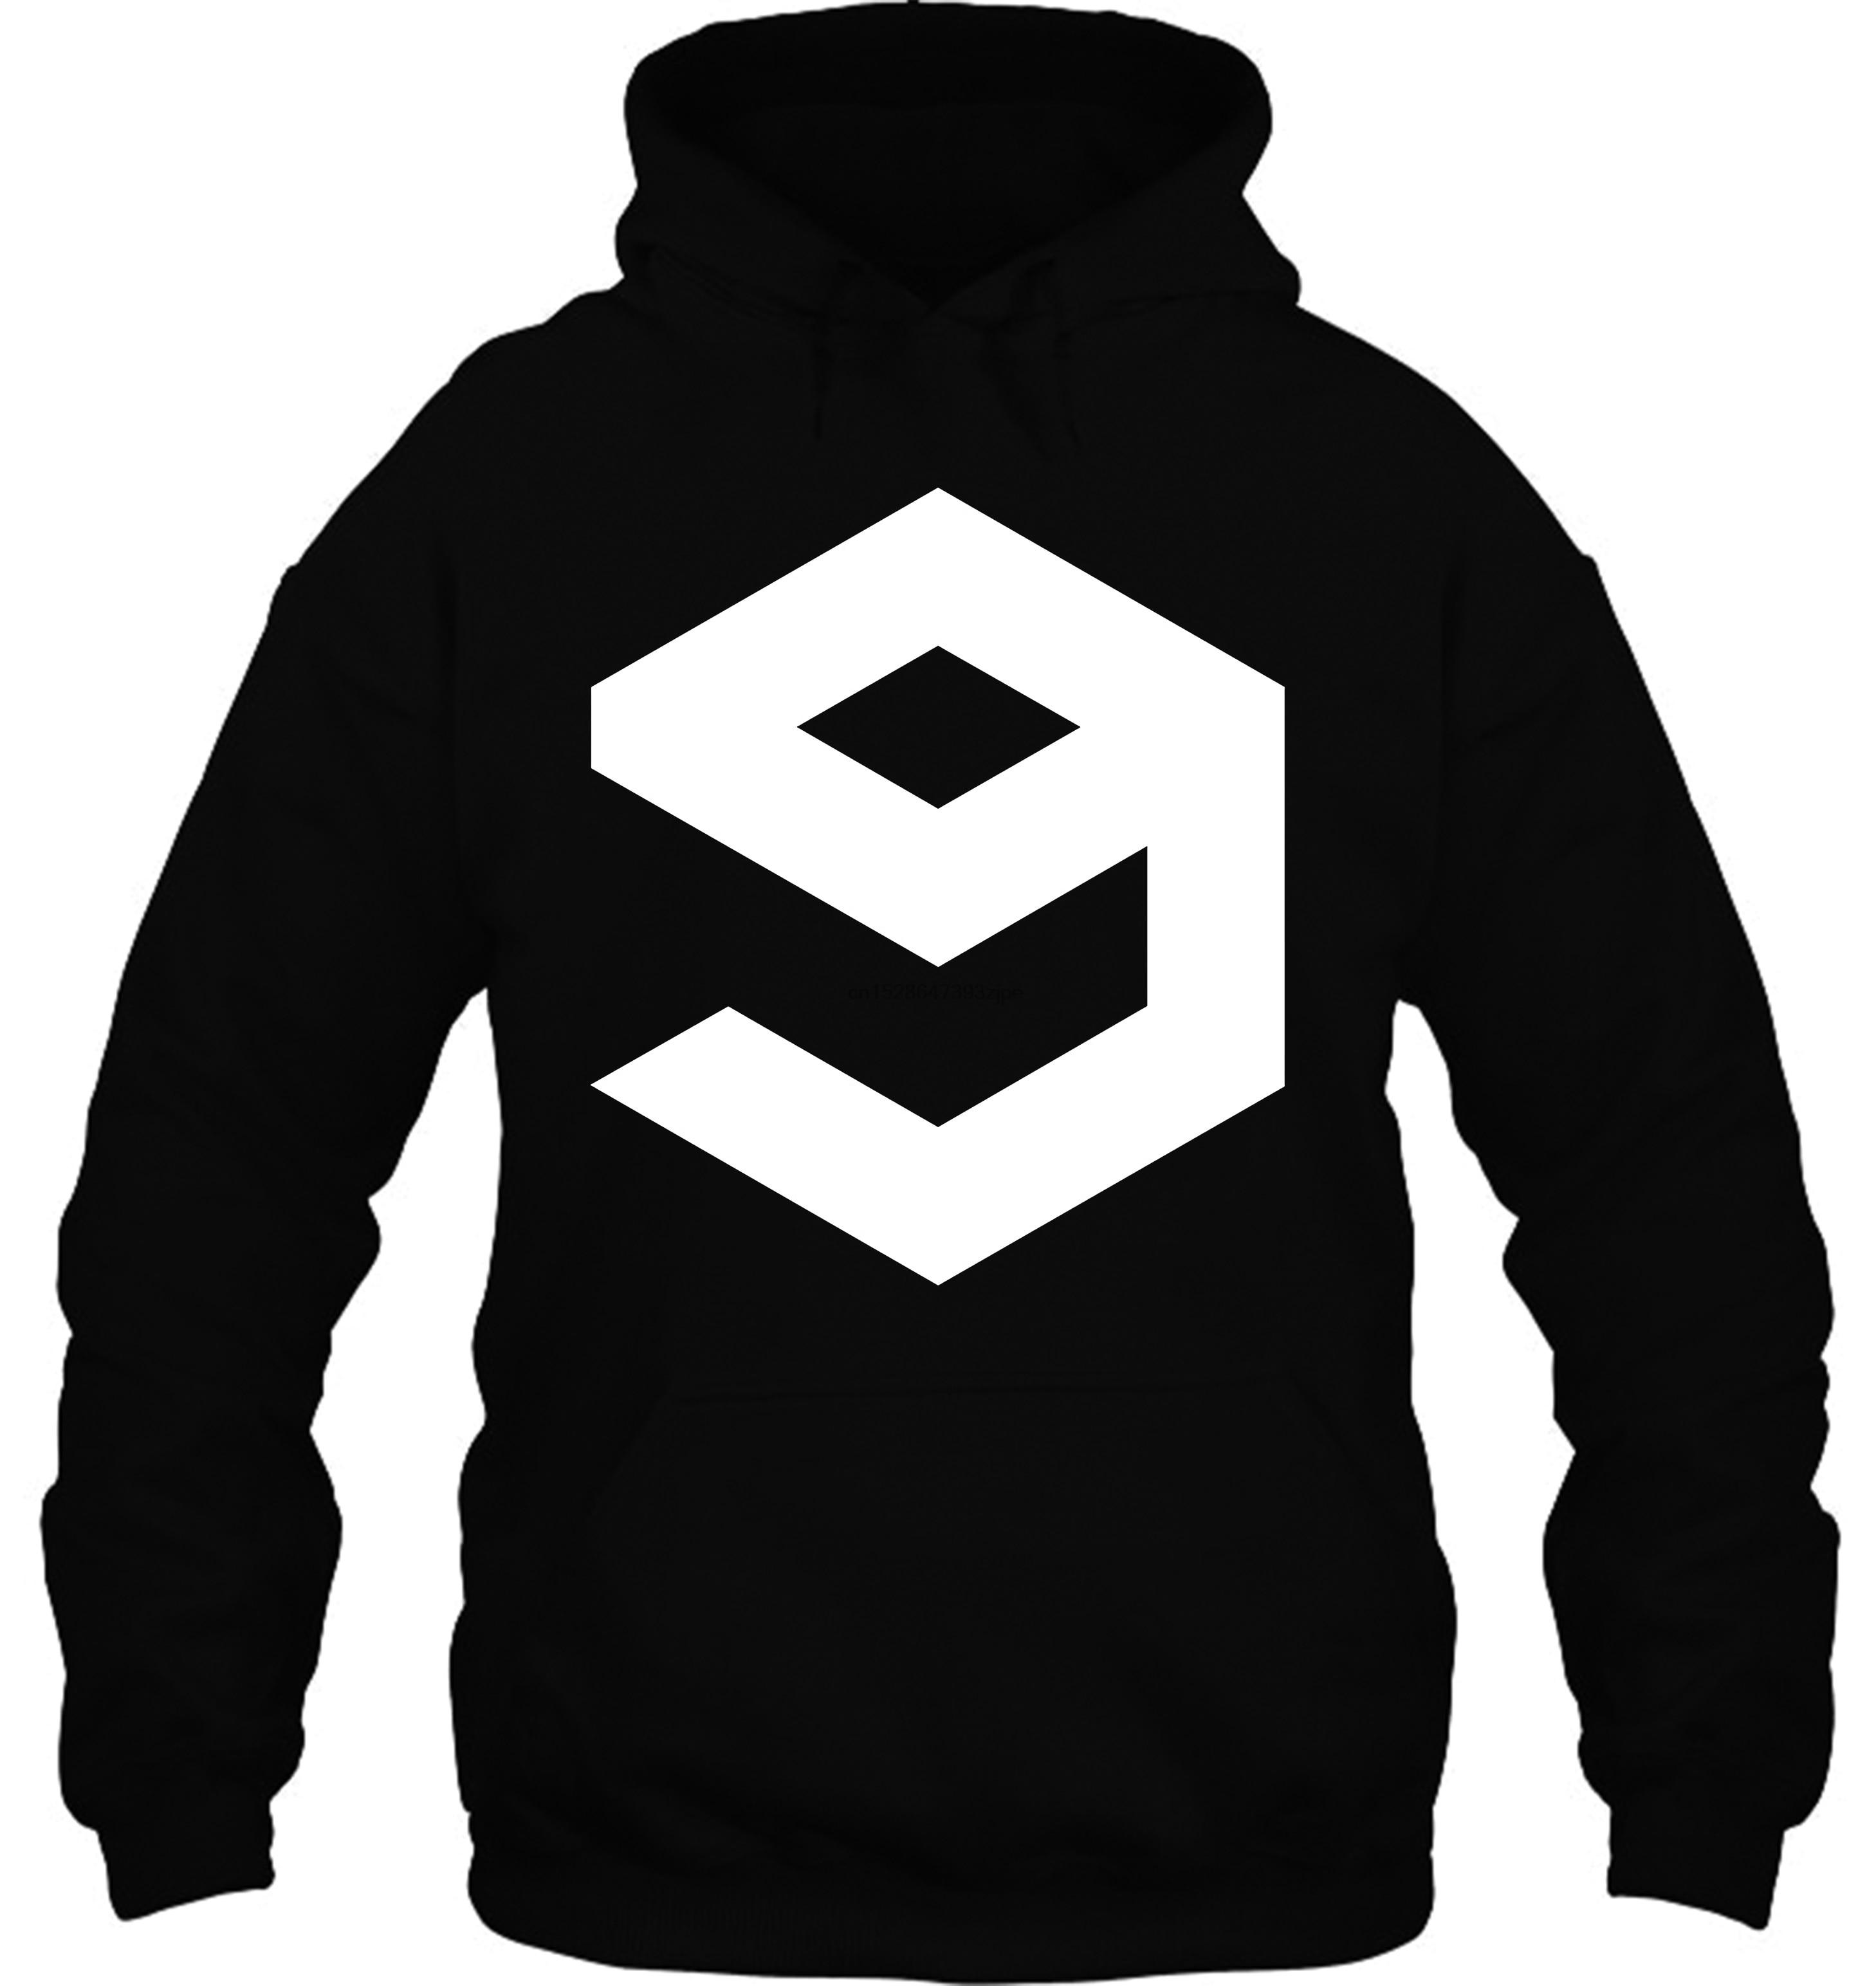 Funny 9gag Symbol Men& Black Clothing Streetwear Men Women Hoodies Sweatshirts